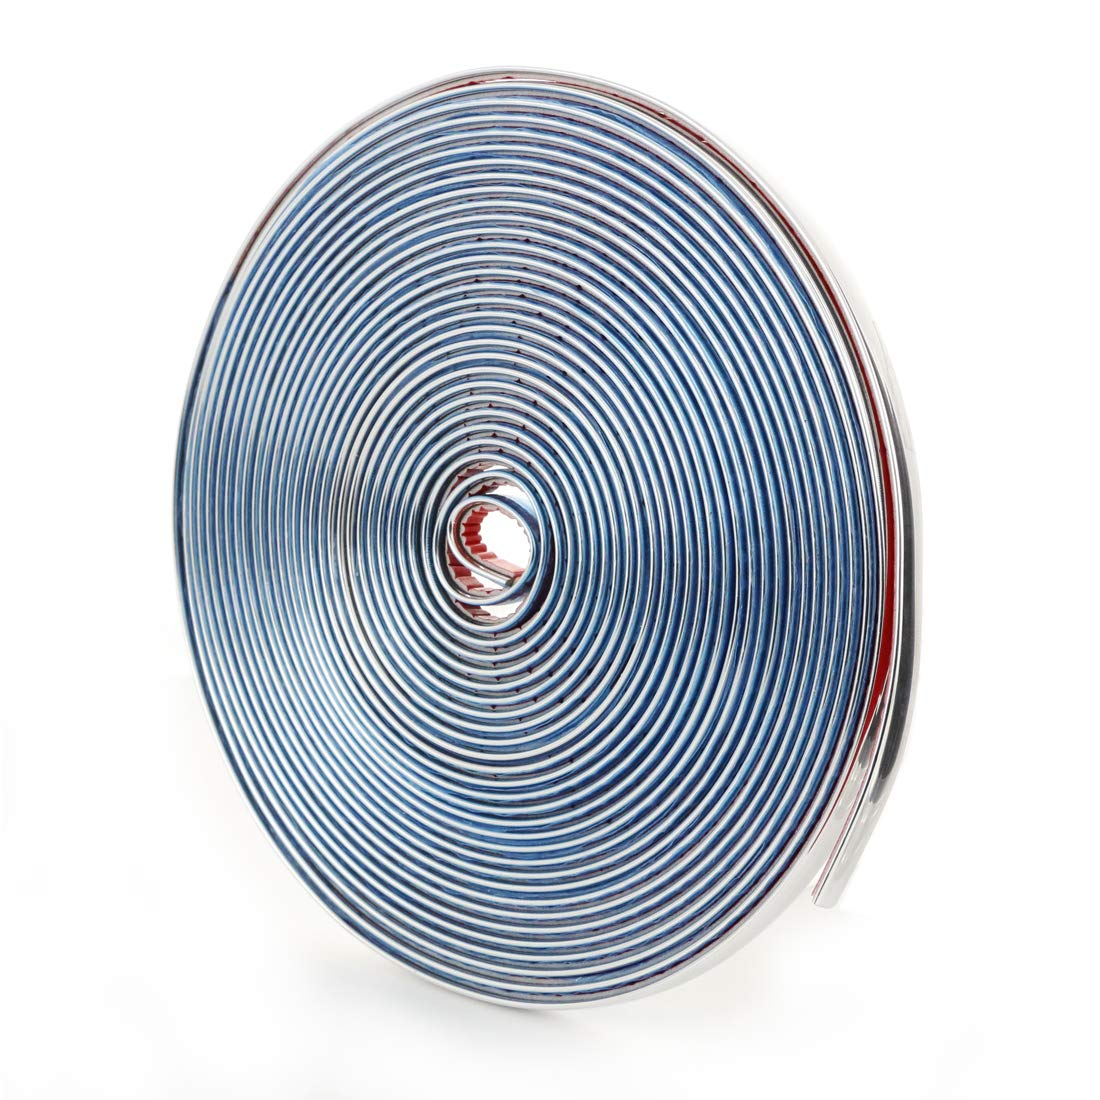 Unbranded Chrom Zierleiste 8 mm x 5m Selbstklebend universal Auto Chromleiste